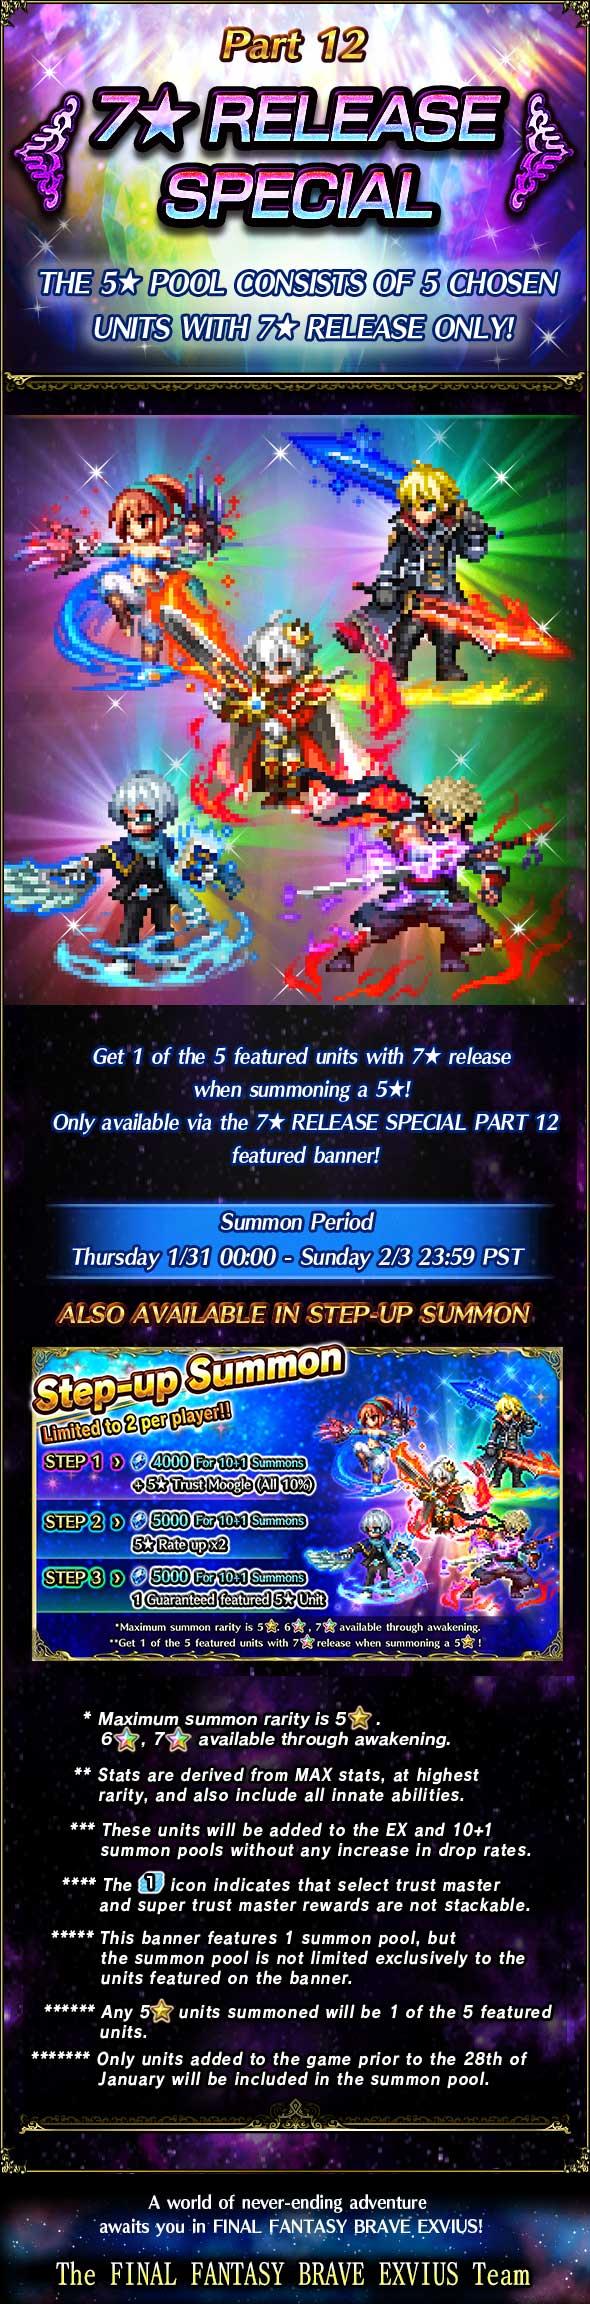 Gl 7 Awakening 7 Release Special Part 11 12 128